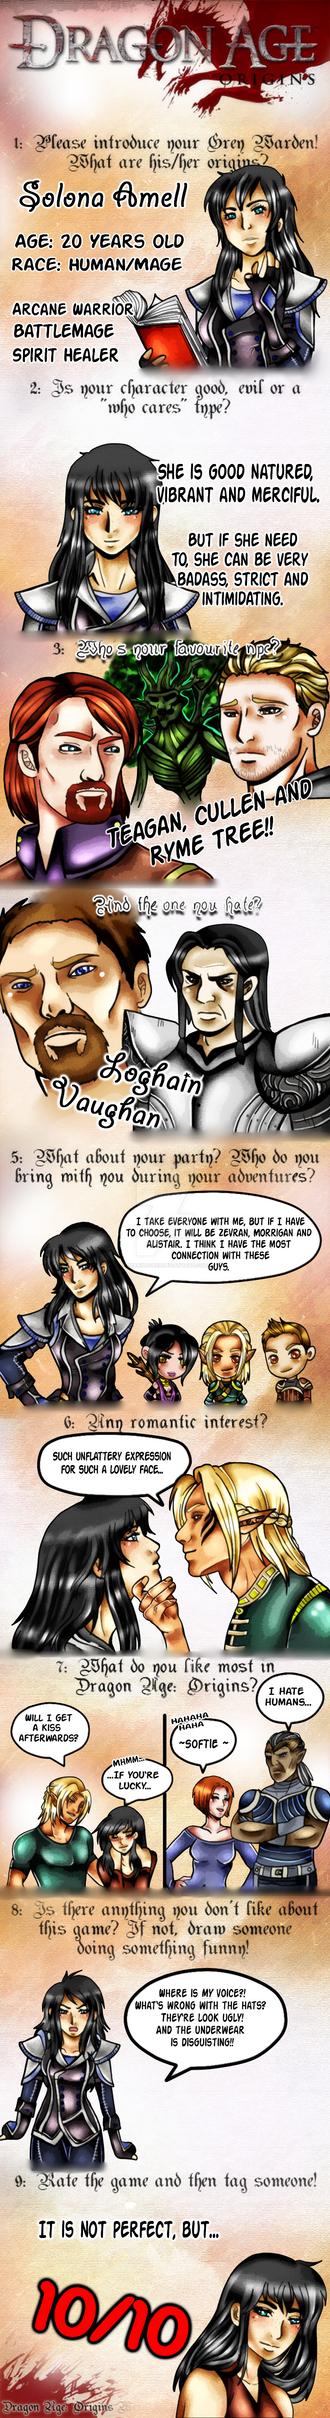 Dragon Age Origins - meme - NEW! by IwarinJones